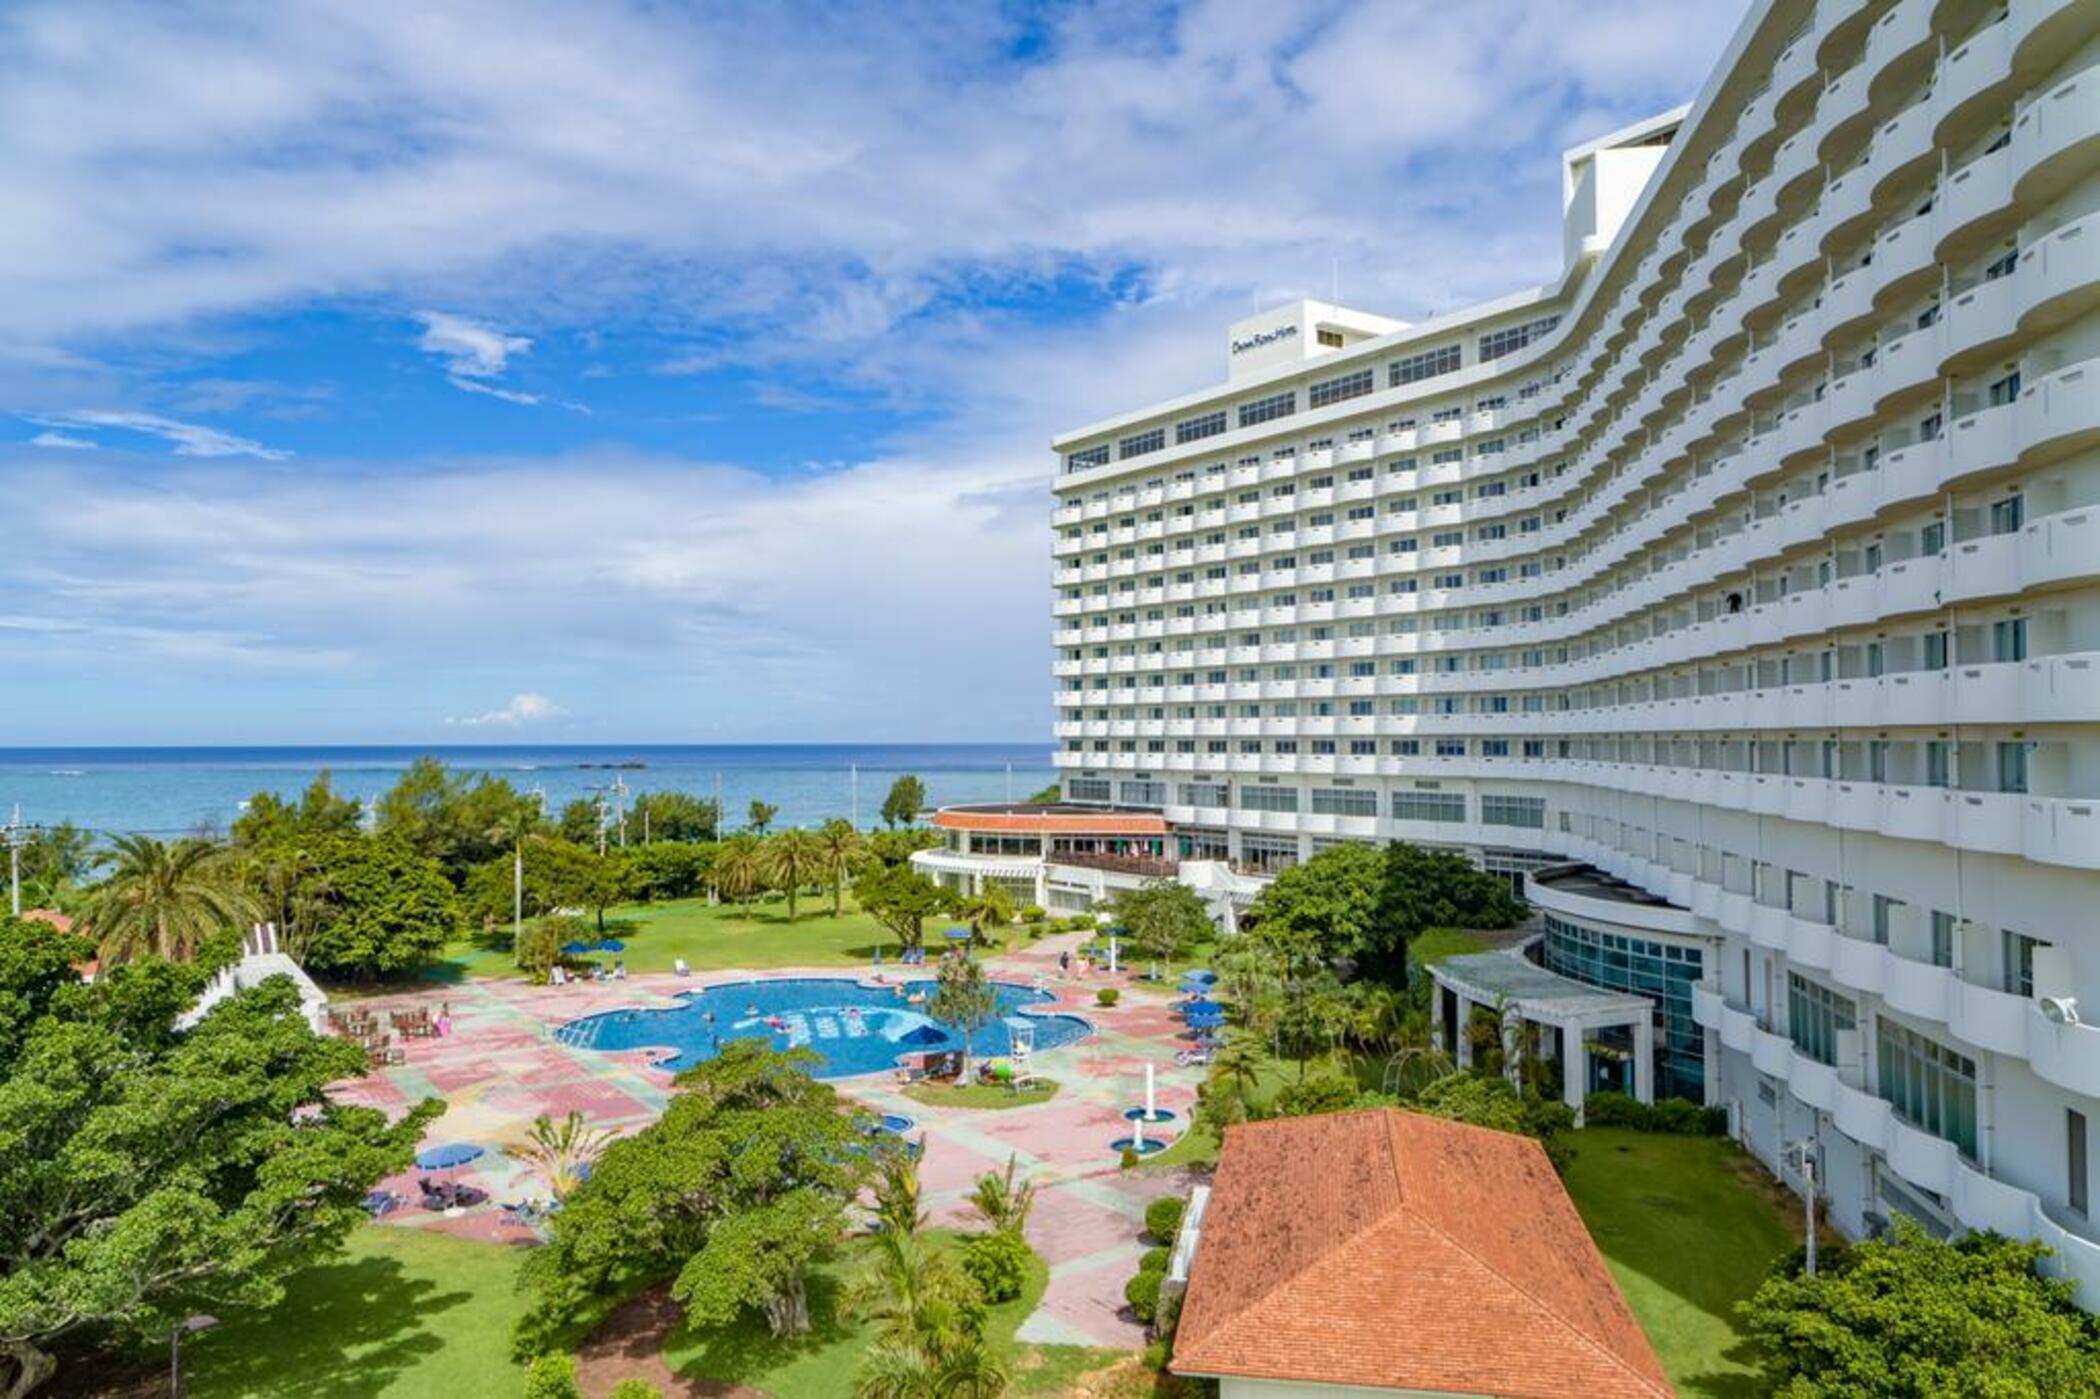 Okinawa Zanpamisaki Royal Hotel, Yomitan